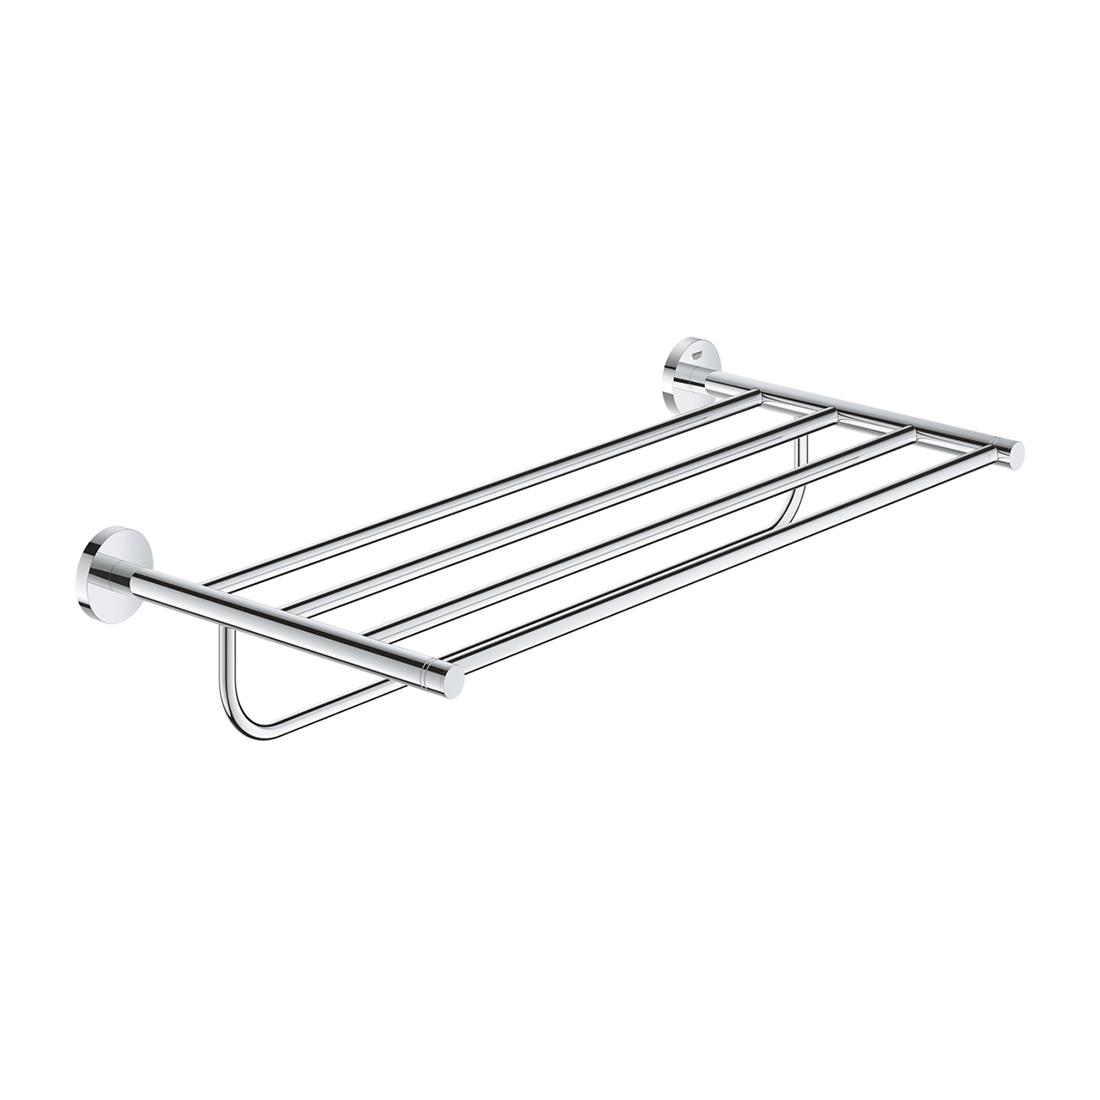 Grohe 40800001 Essentials Multi Bath Towel Rack